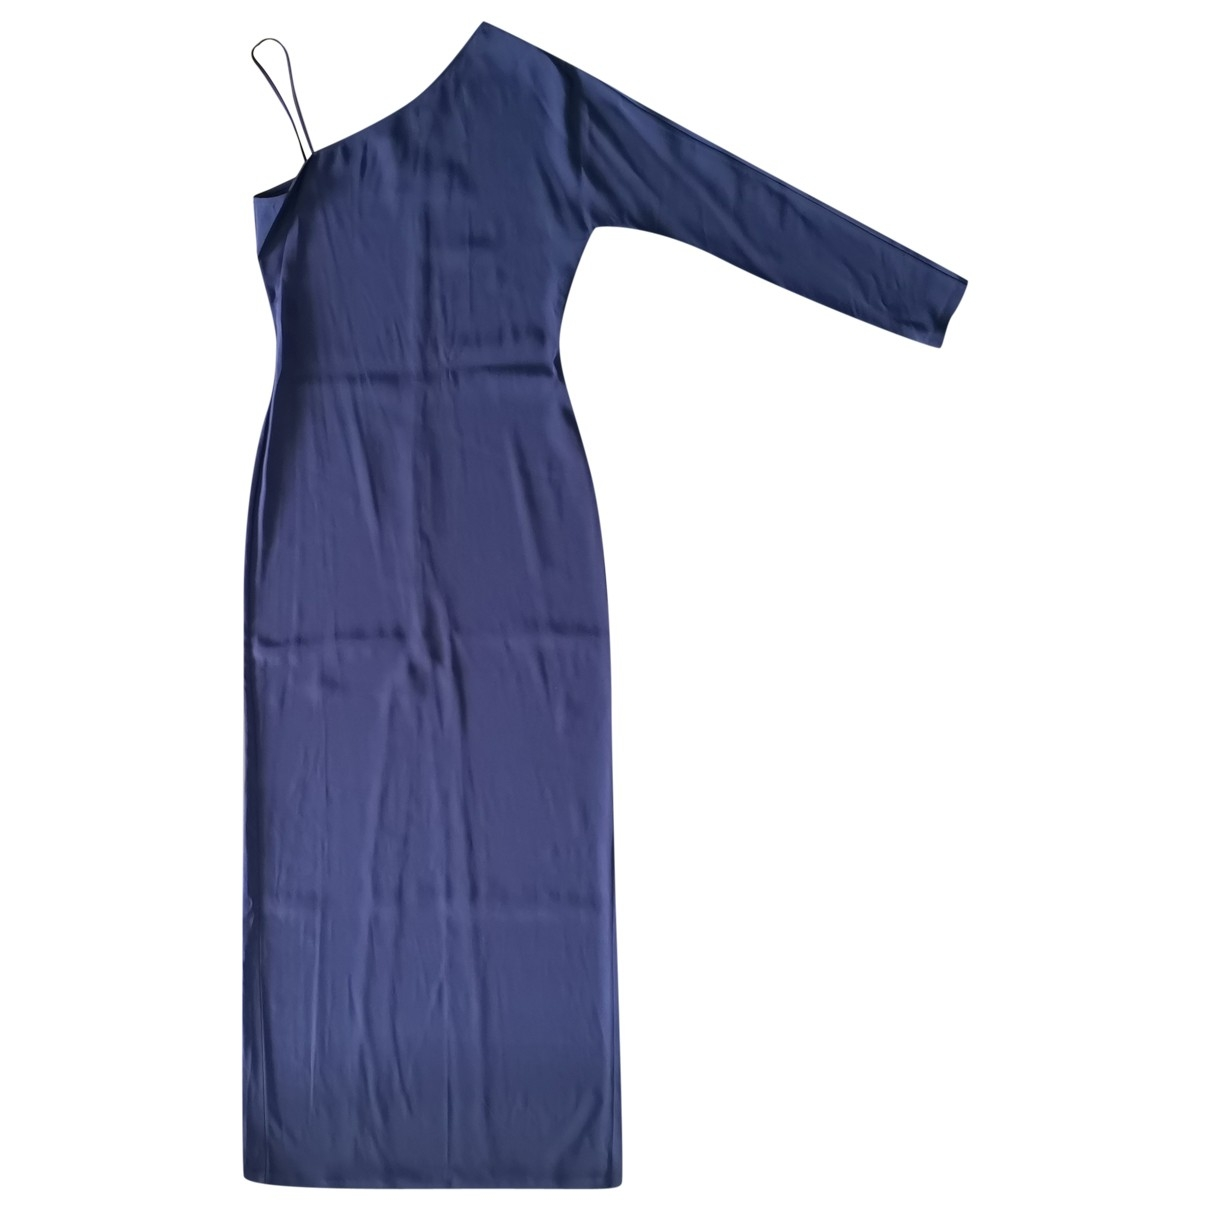 Maison Martin Margiela \N Blue dress for Women 42 IT